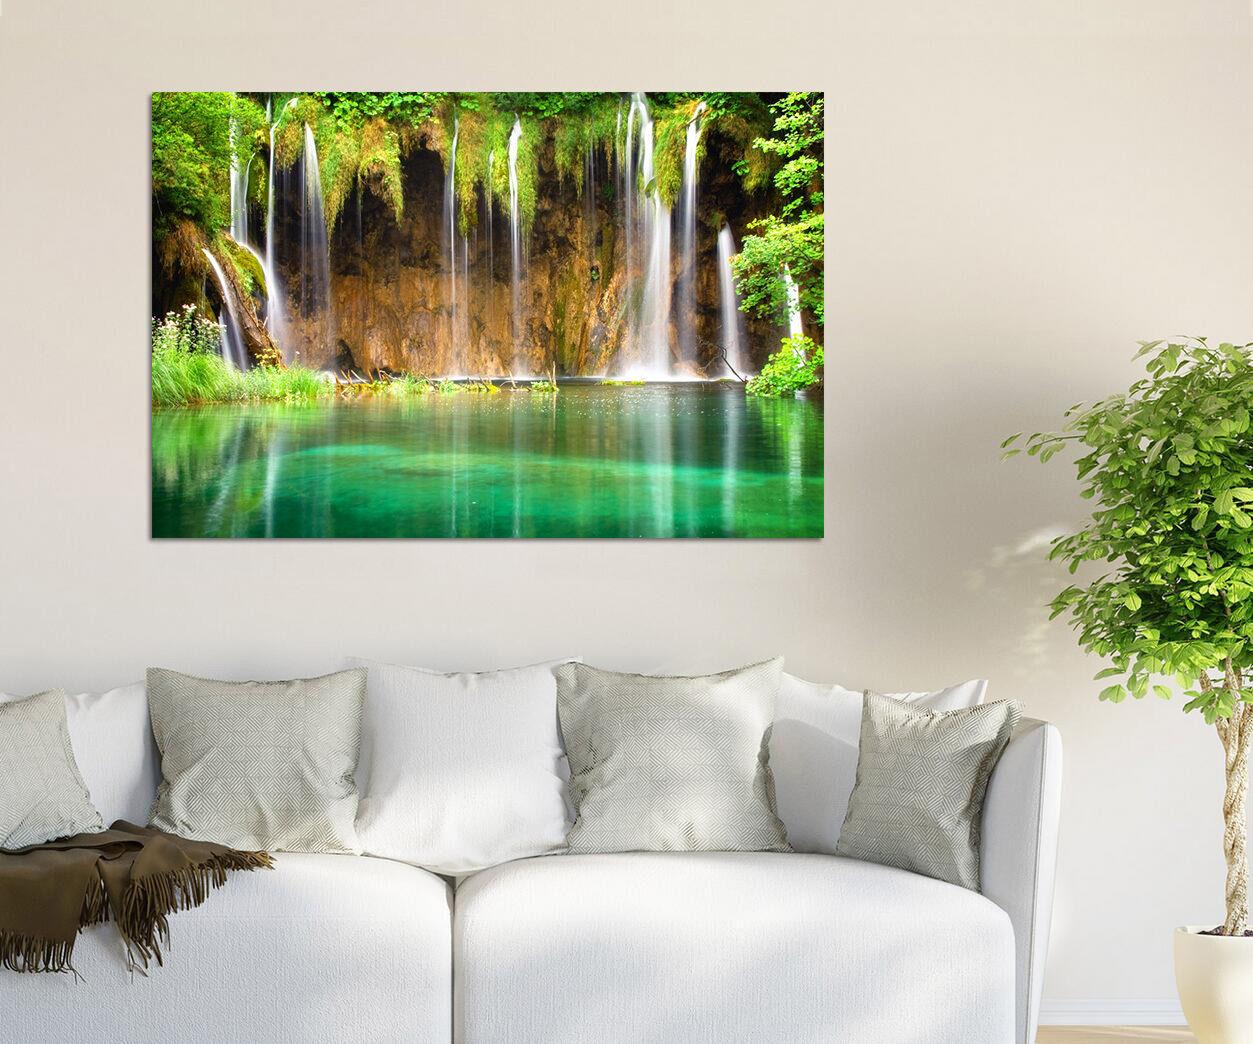 3D Fluss Schlamm Gras Vorhang 8 Fototapeten Wandbild BildTapete AJSTORE DE Lemon